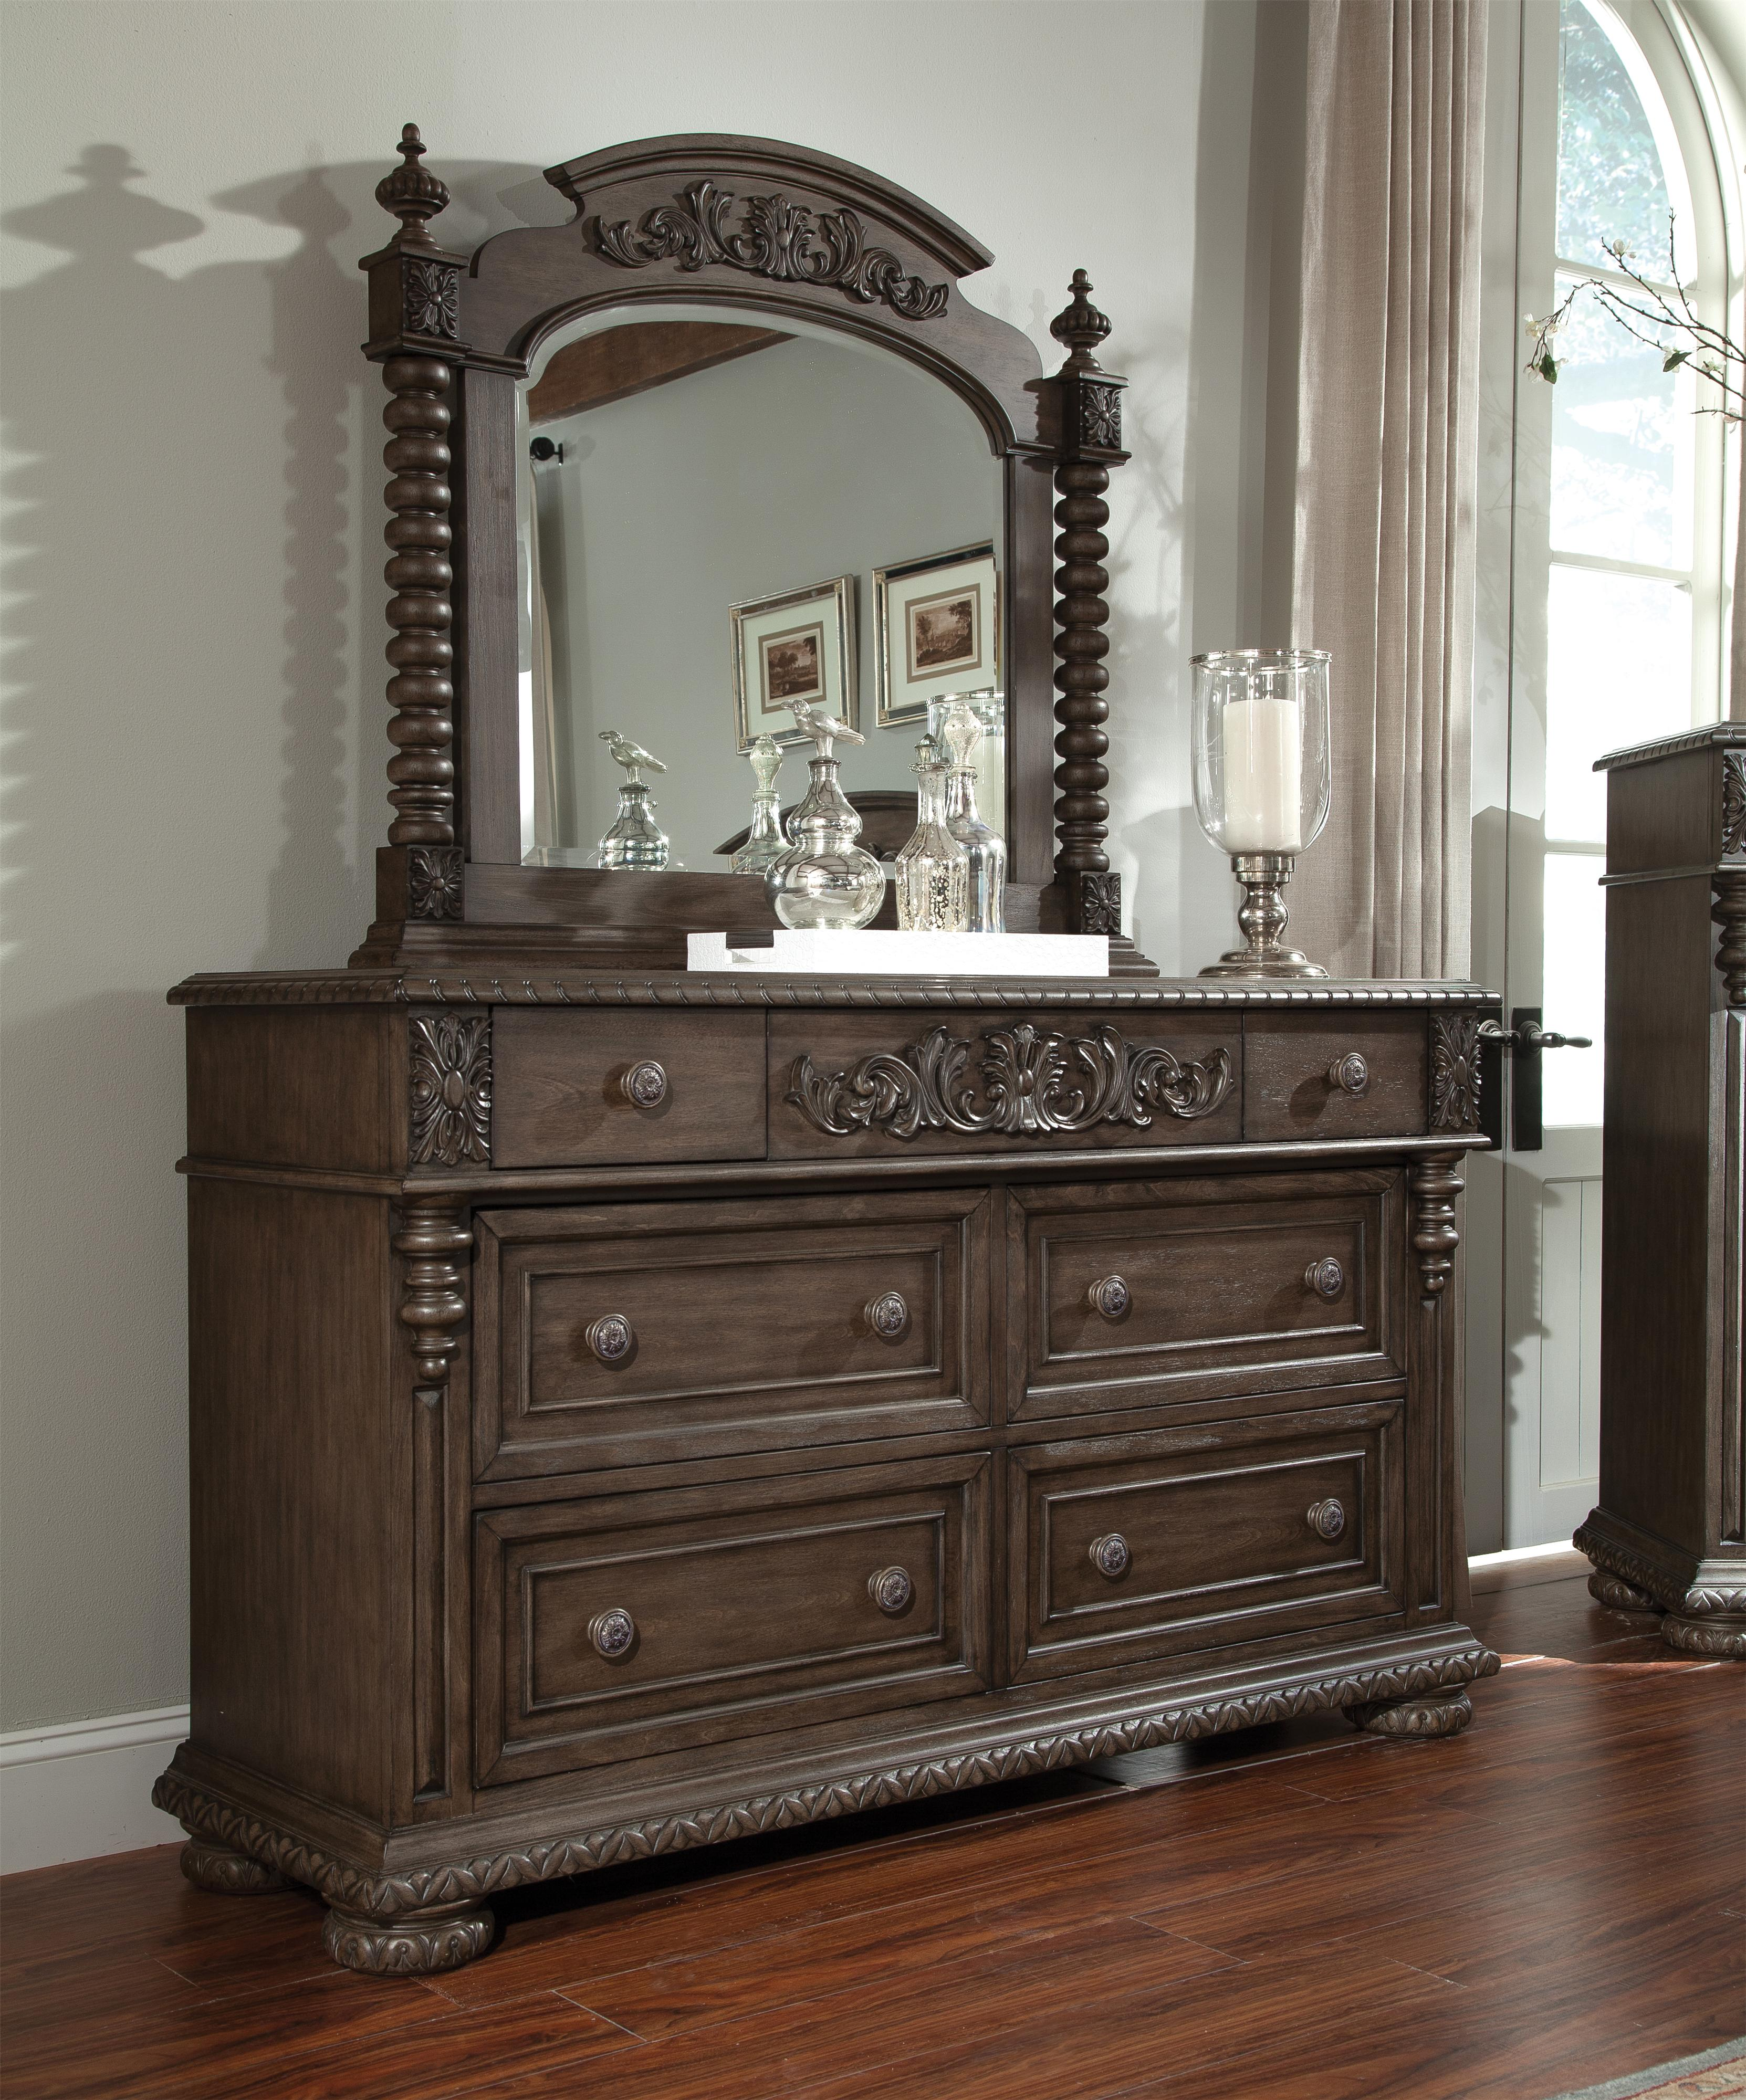 Belfort Basics Virginia Manor Dresser and Mirror Set - Item Number: 980-650 DRES+60 MIRR